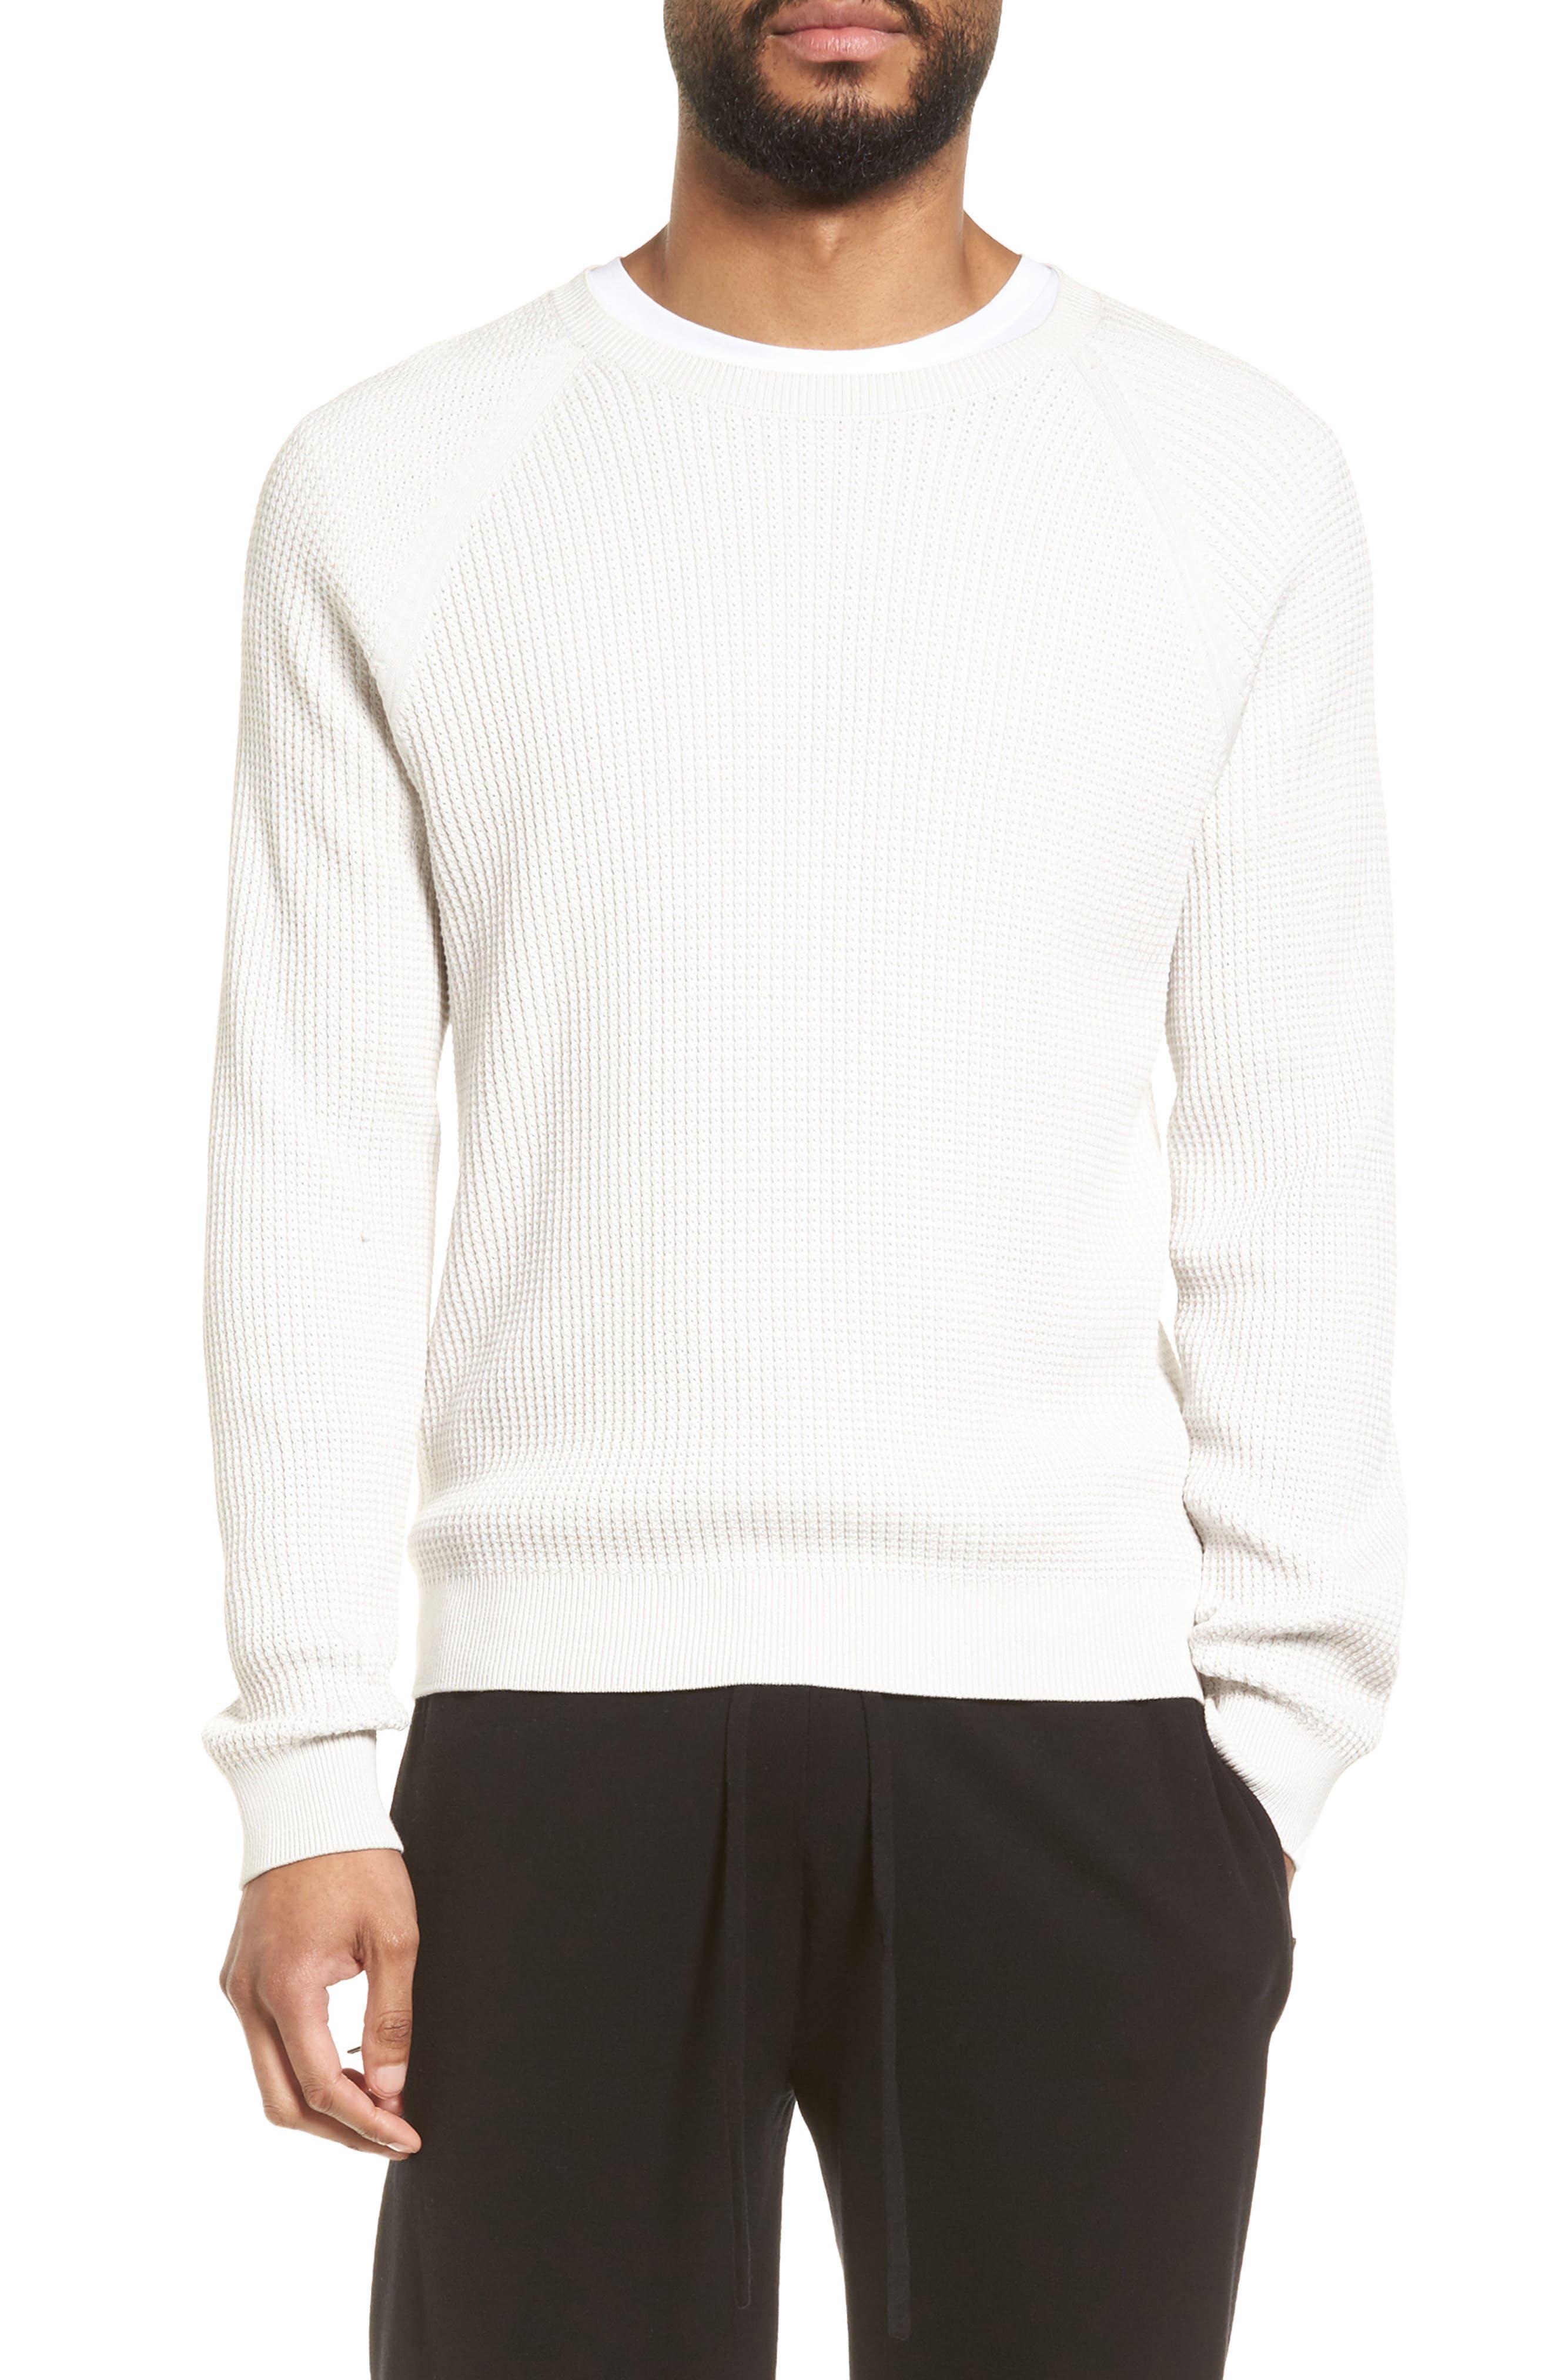 Vince Slim Fit Thermal Knit Raglan Sweater